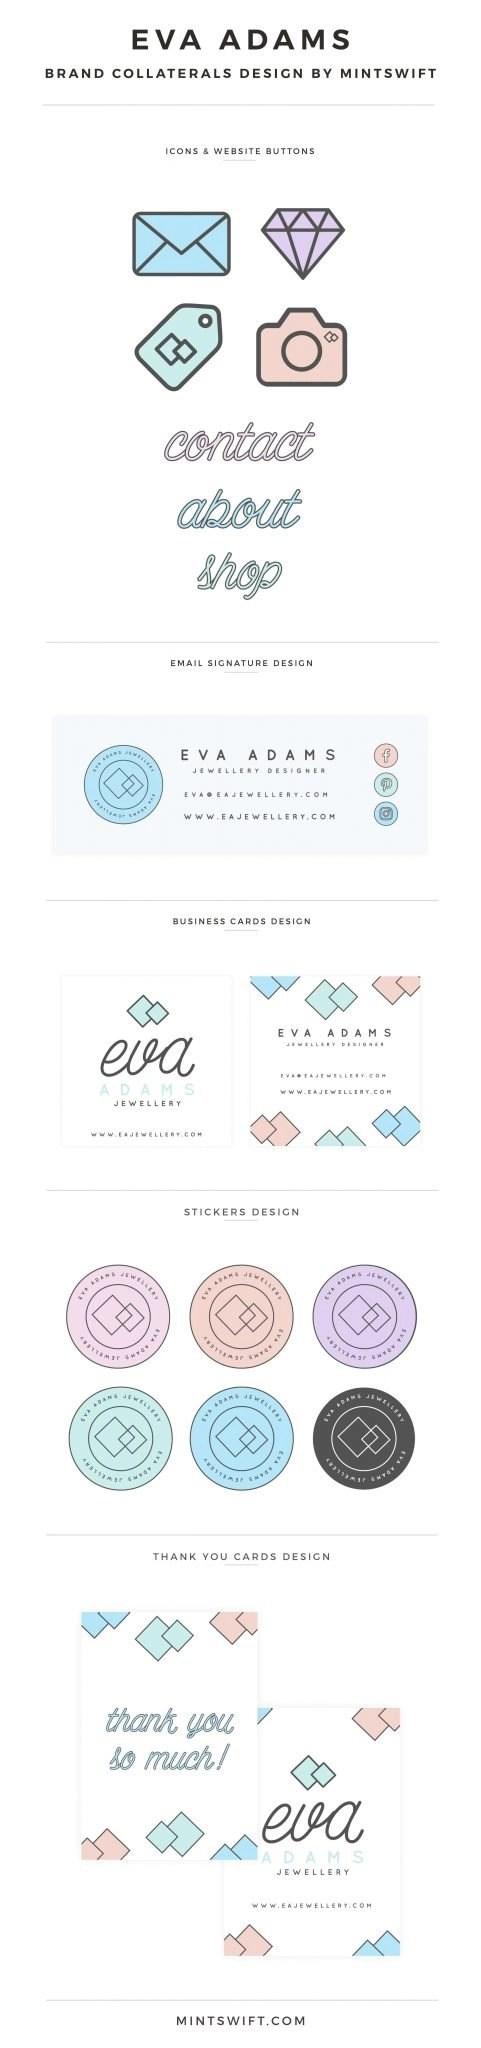 Eva Adams - Brand Collaterals Design by MintSwift